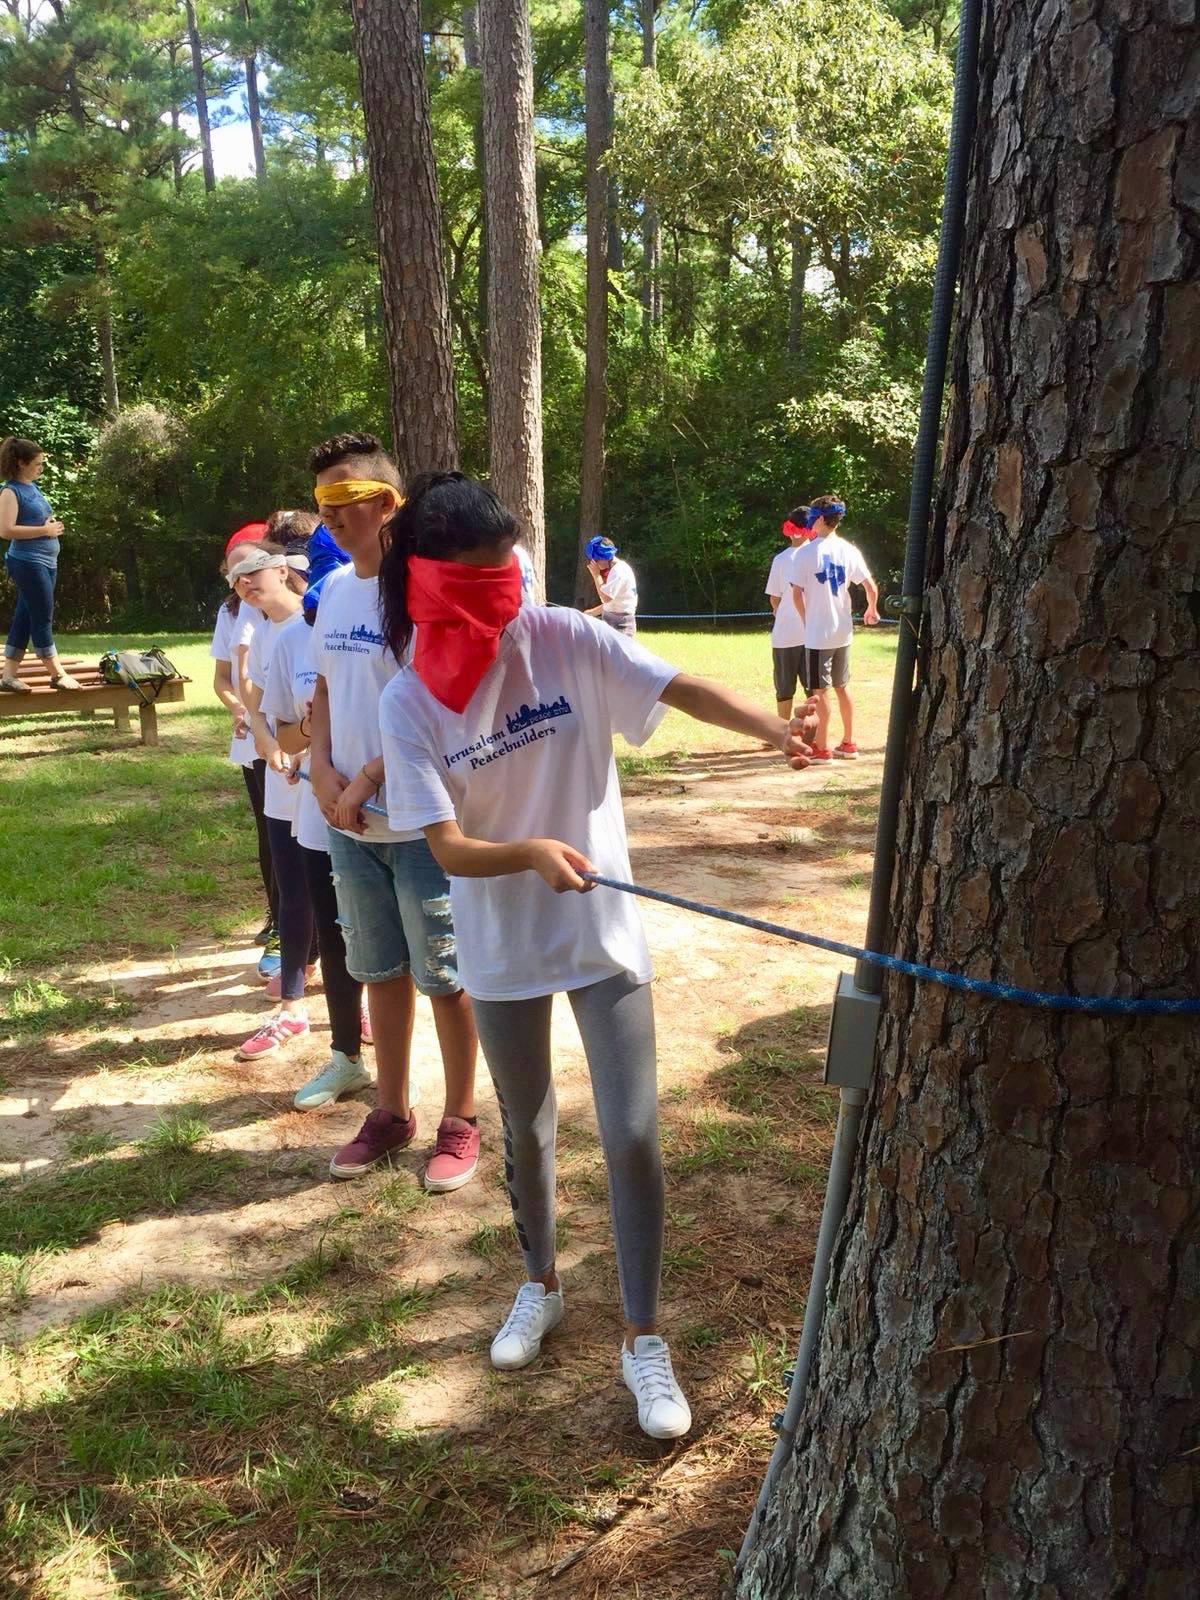 Low ropes challenge